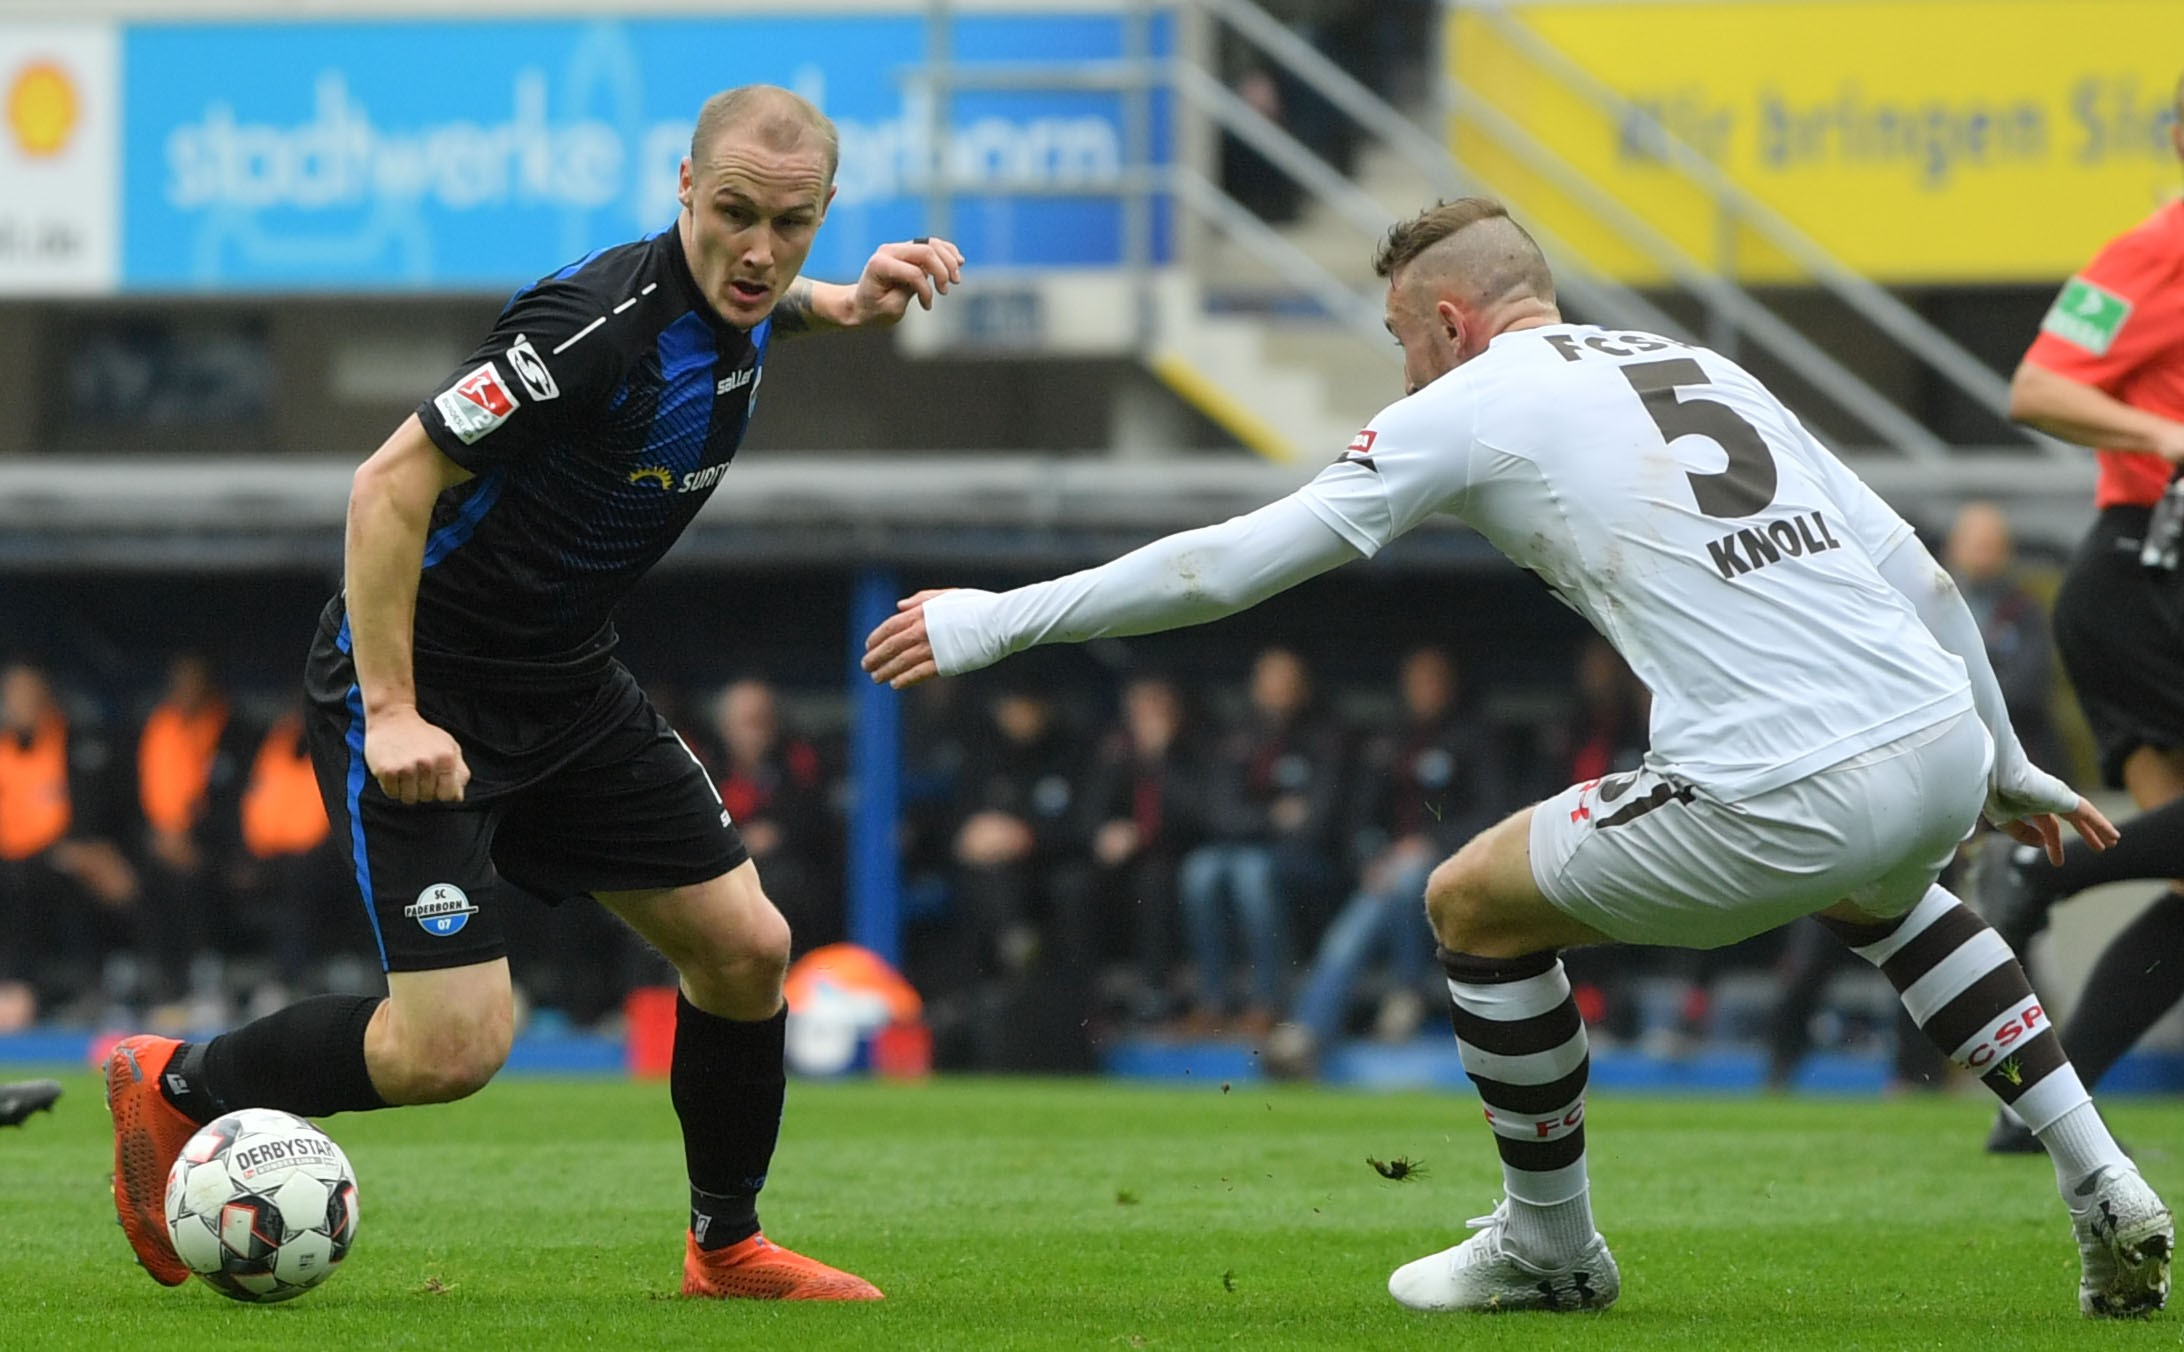 Vorbericht: SC Paderborn – FC St. Pauli (8. Spieltag, 20/21)